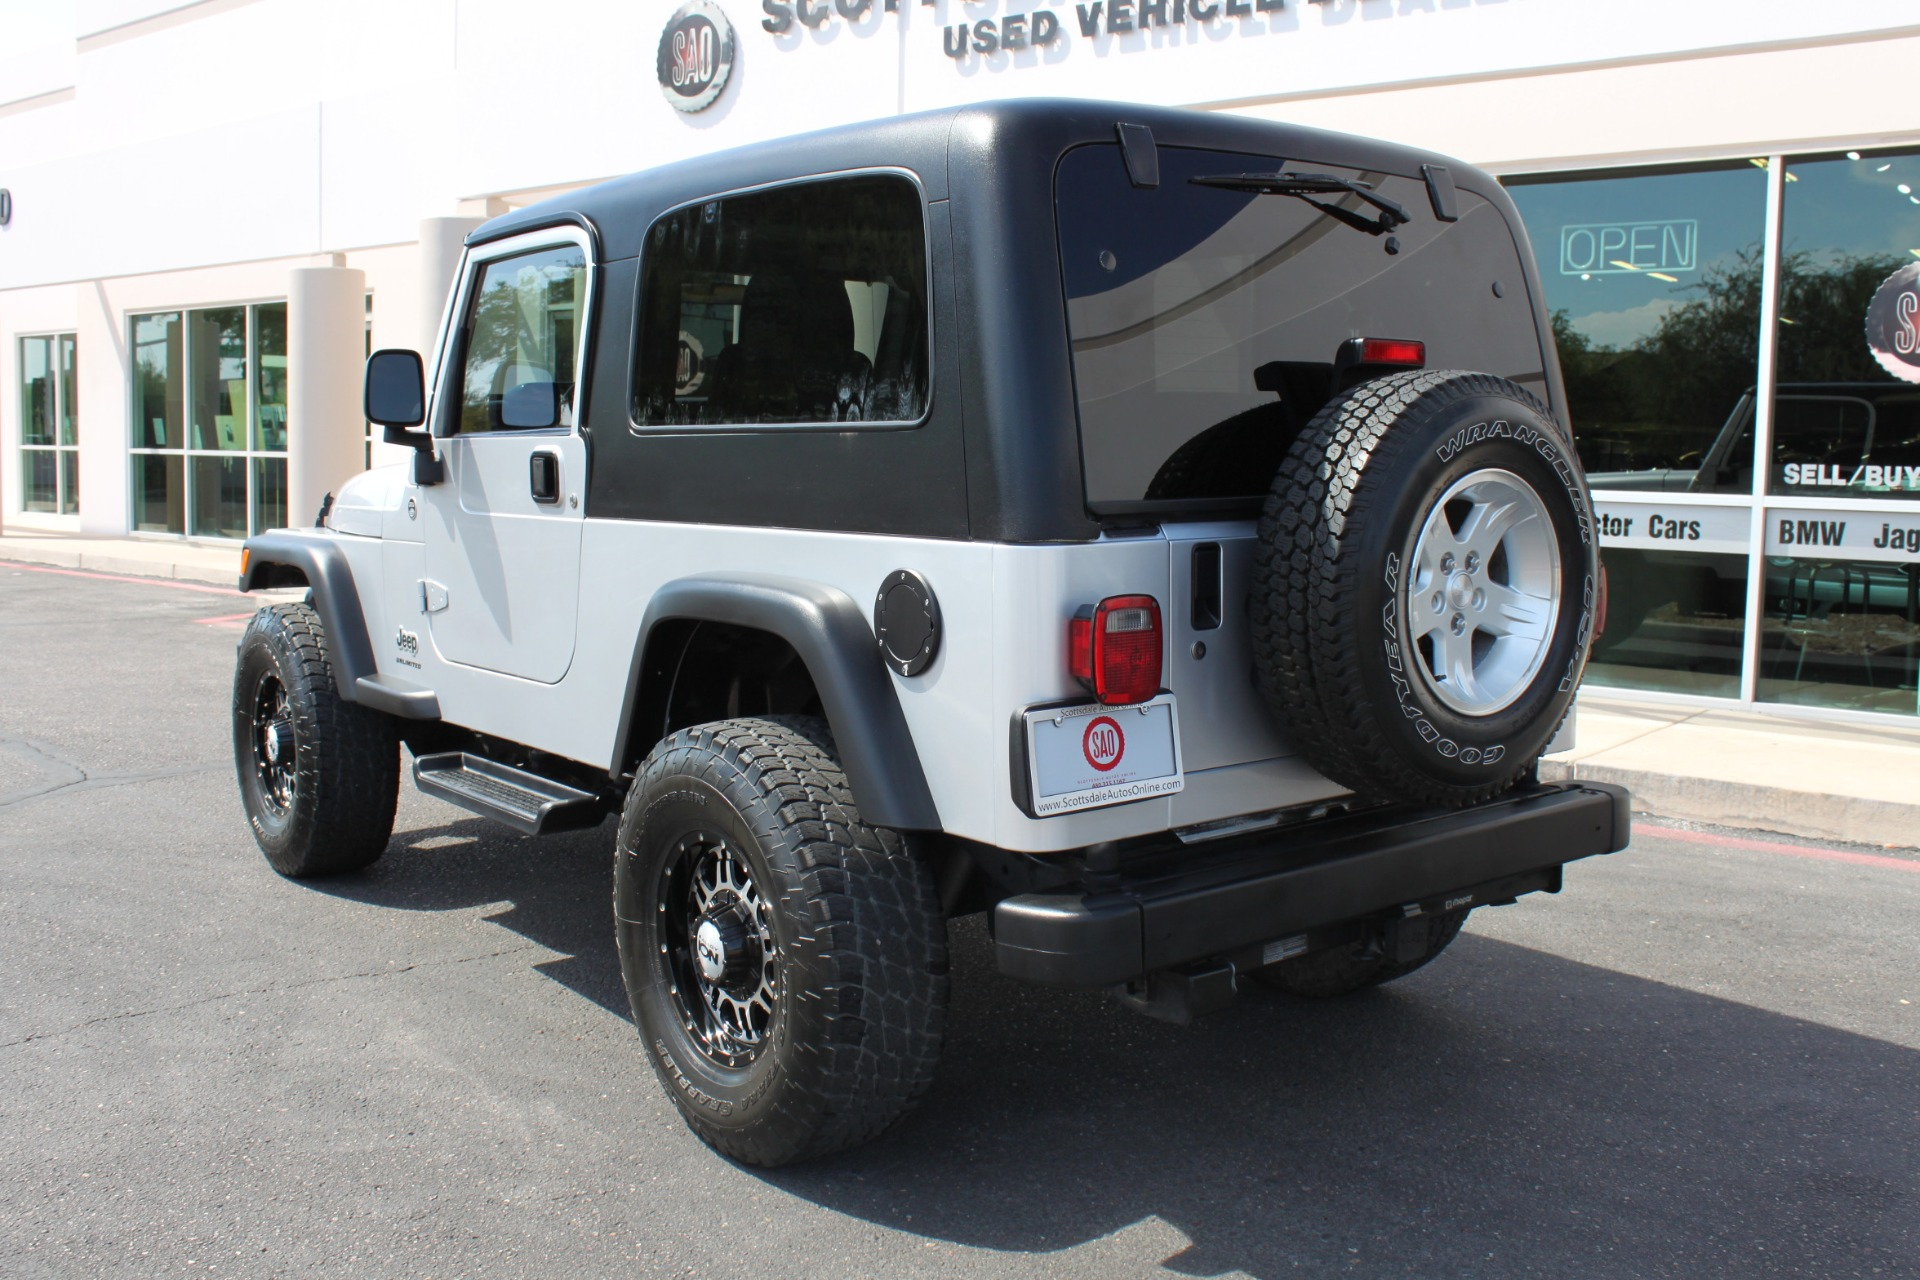 Used-2006-Jeep-Wrangler-Unlimited-LWB-Grand-Wagoneer